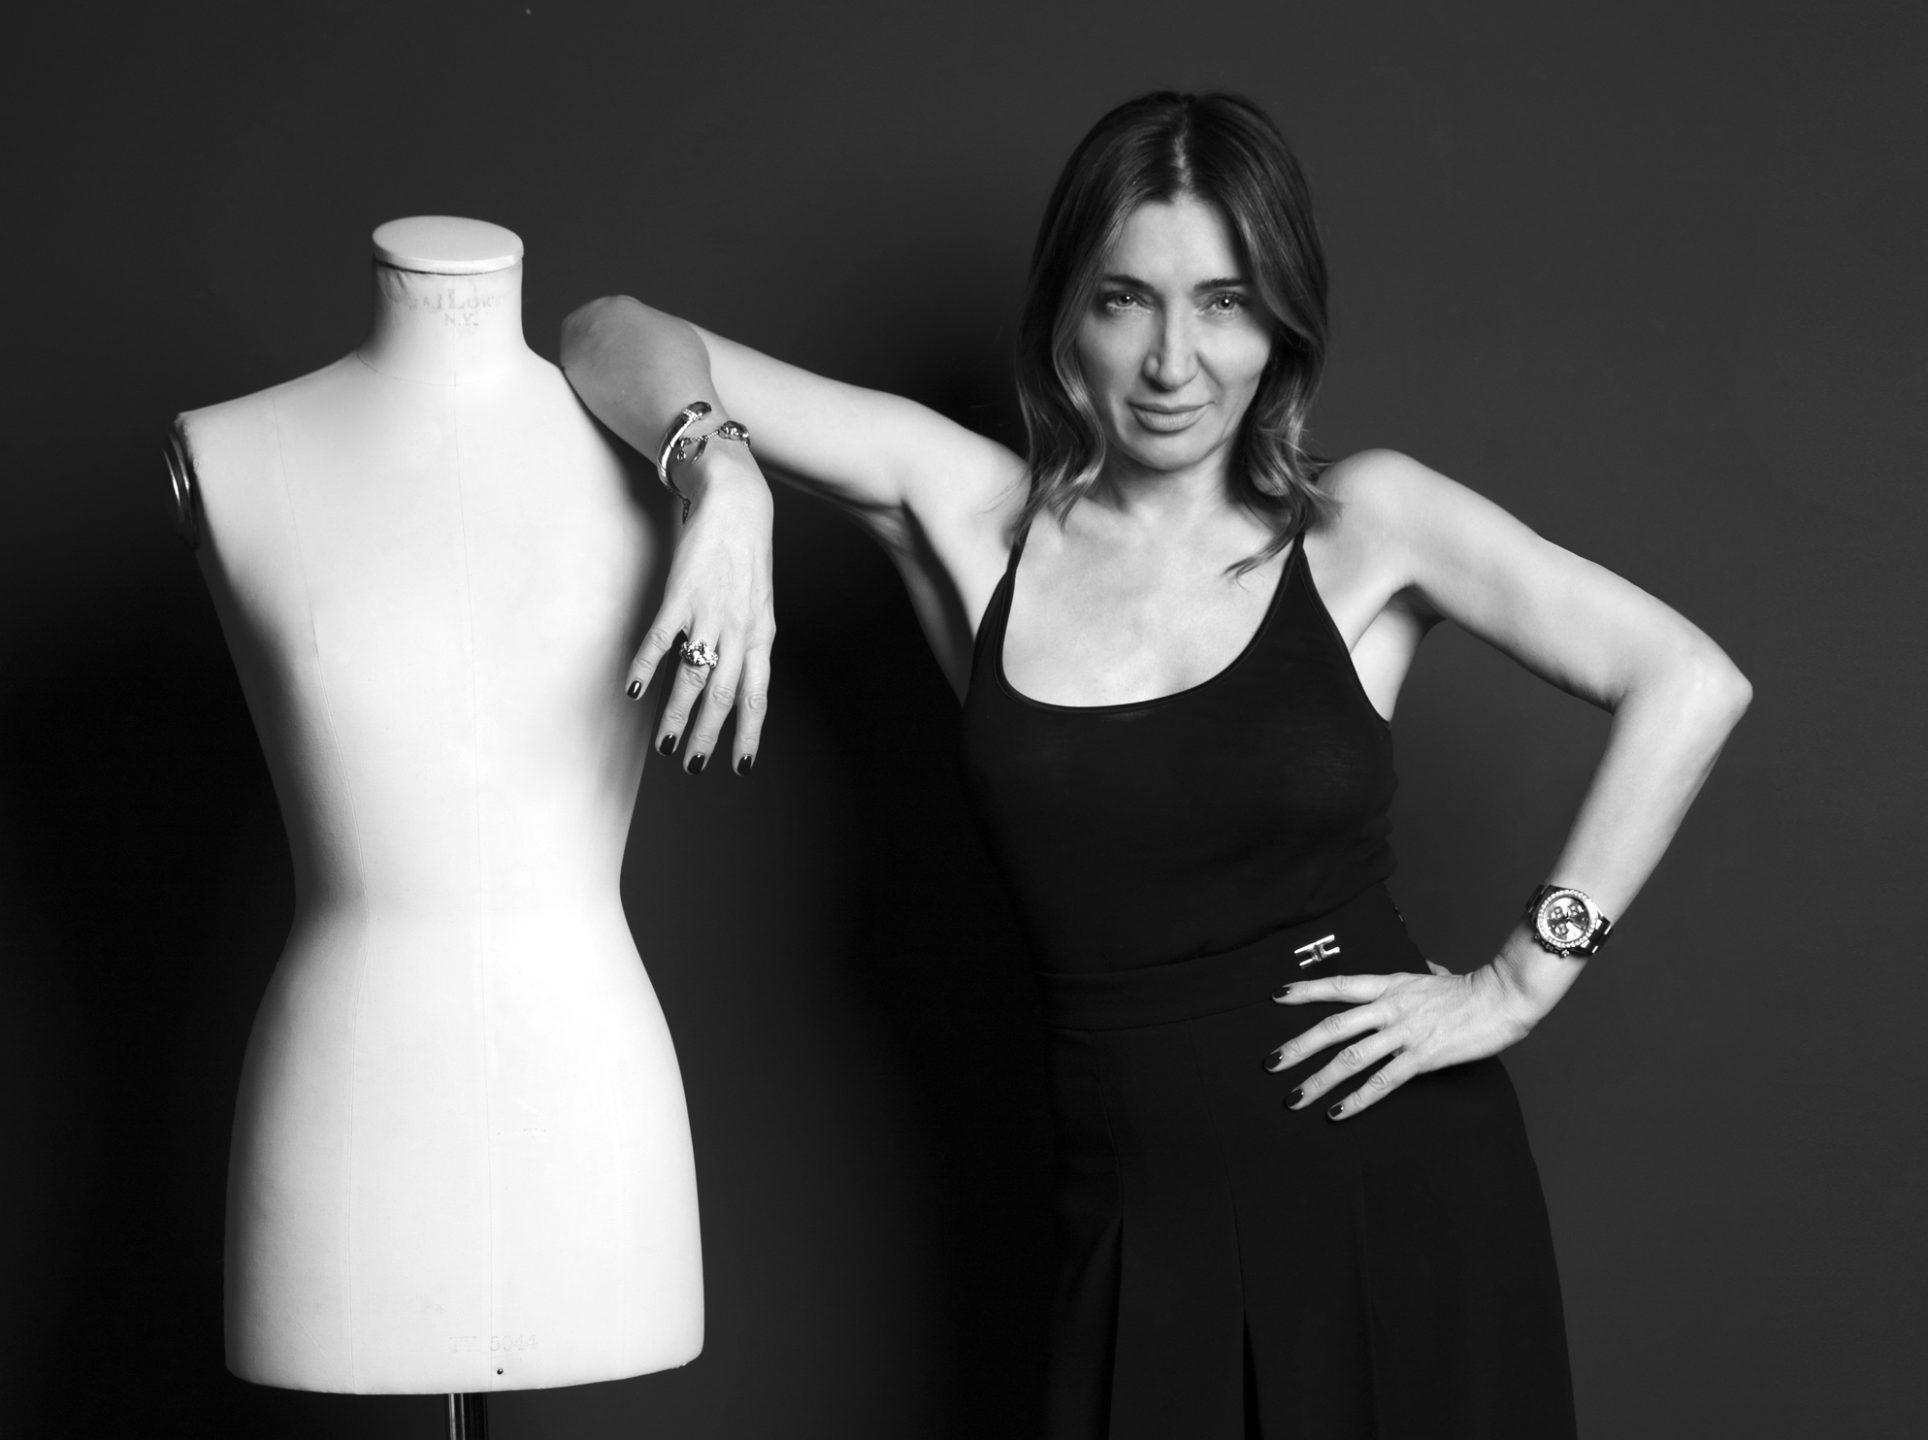 La stilista Elisabetta Franchi